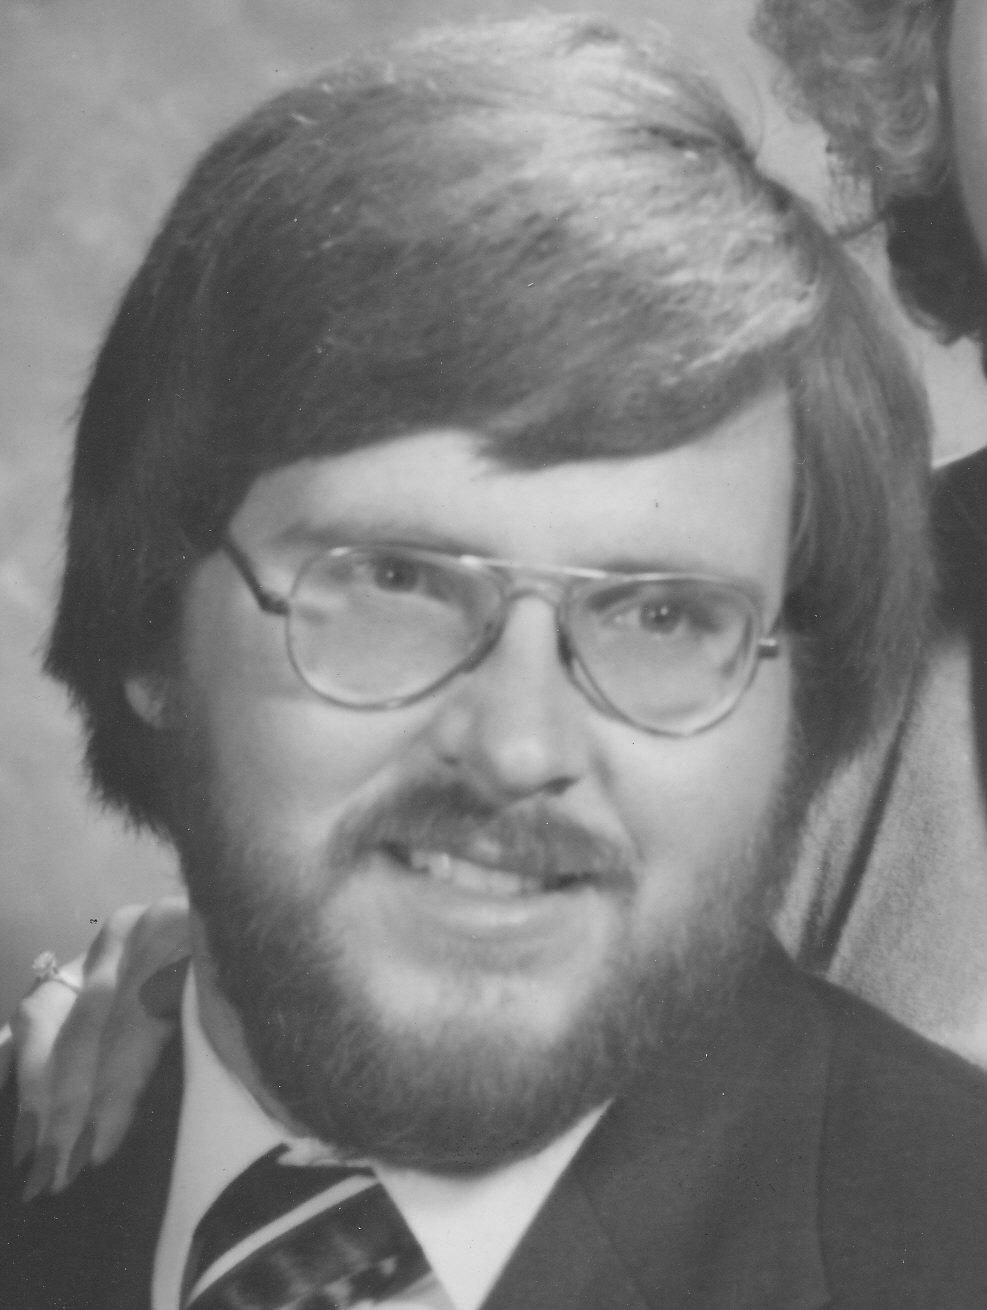 Edward W. Ozak